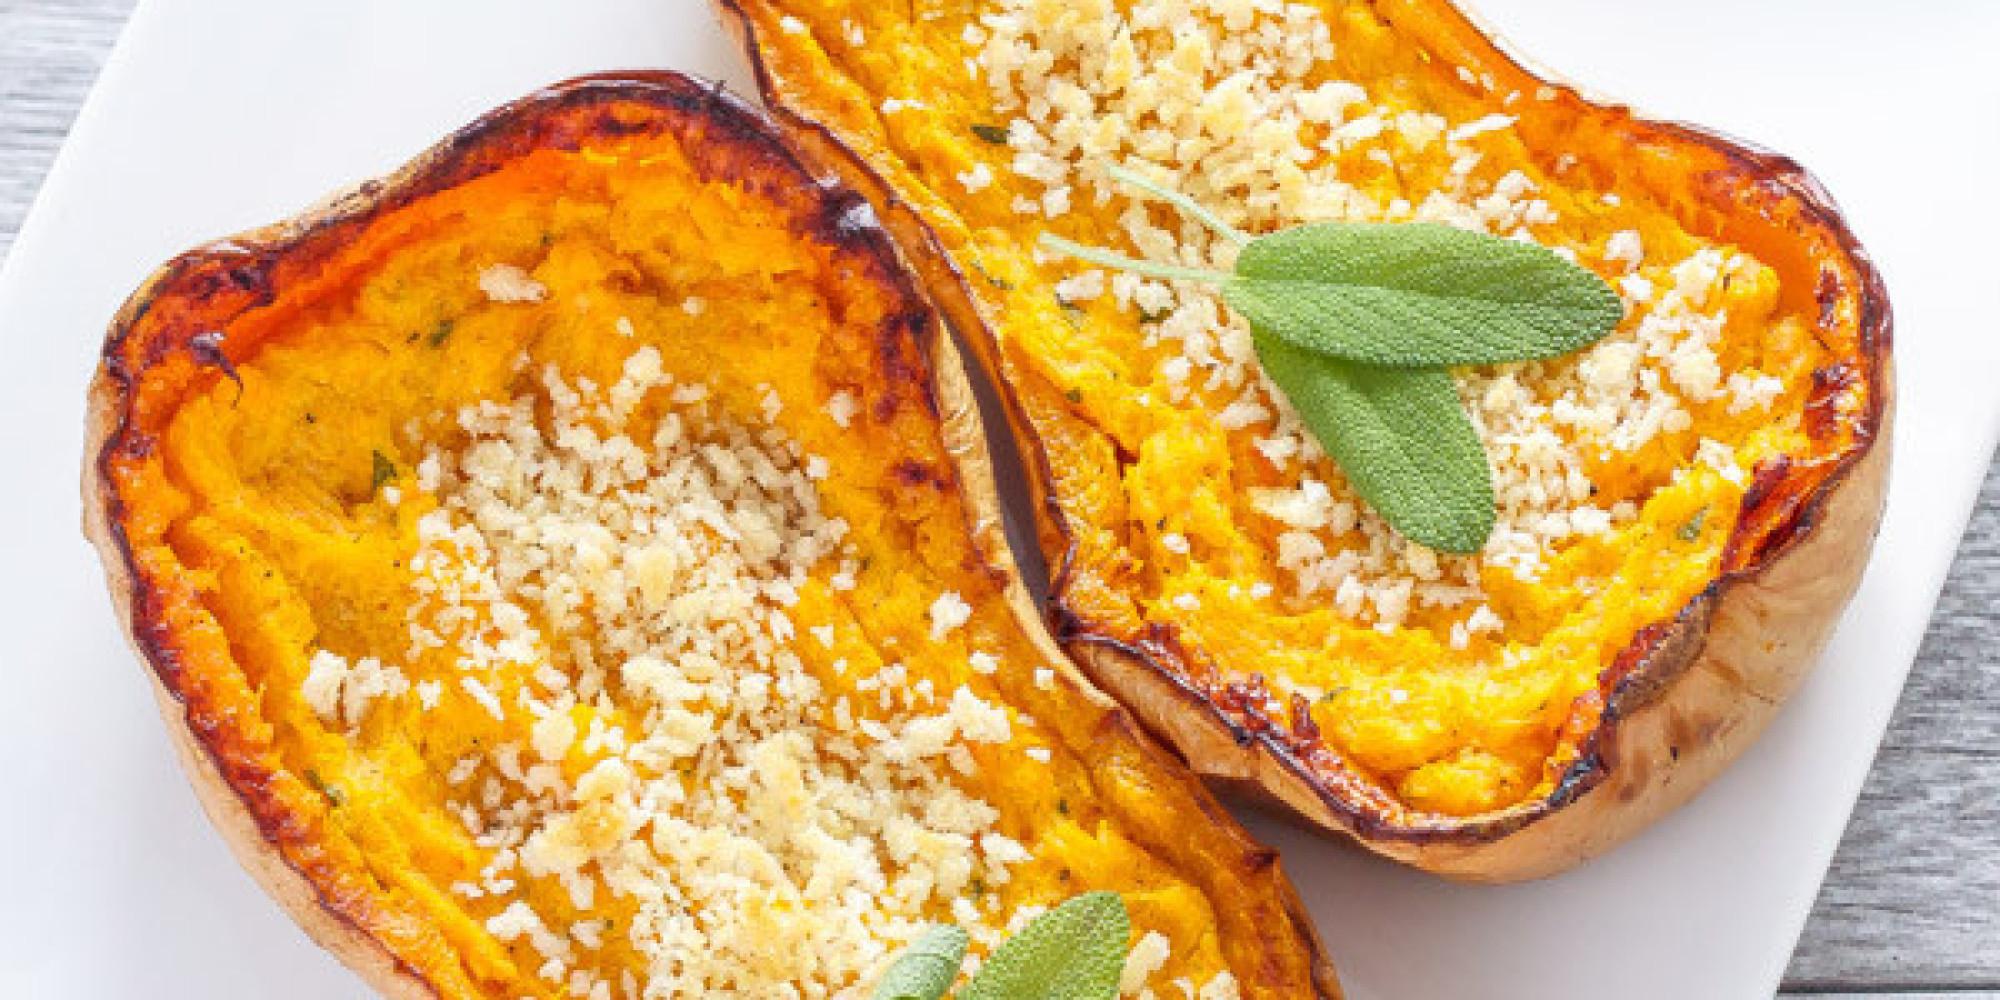 Easy Vegetarian Thanksgiving Recipes  Ve arian Thanksgiving Recipes That ll Steal The Turkey s